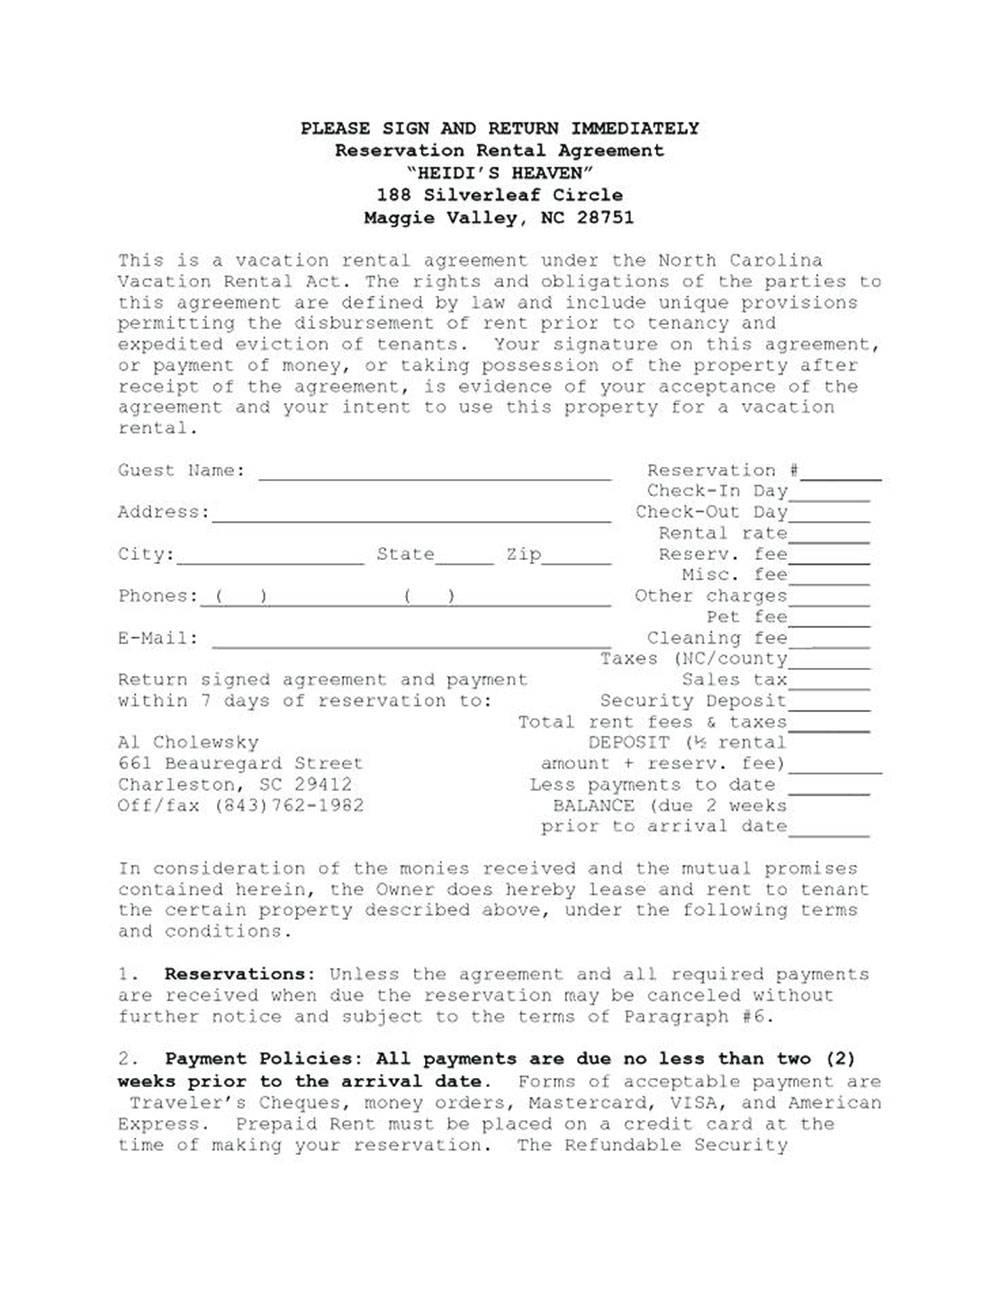 House Rental Agreements Templates